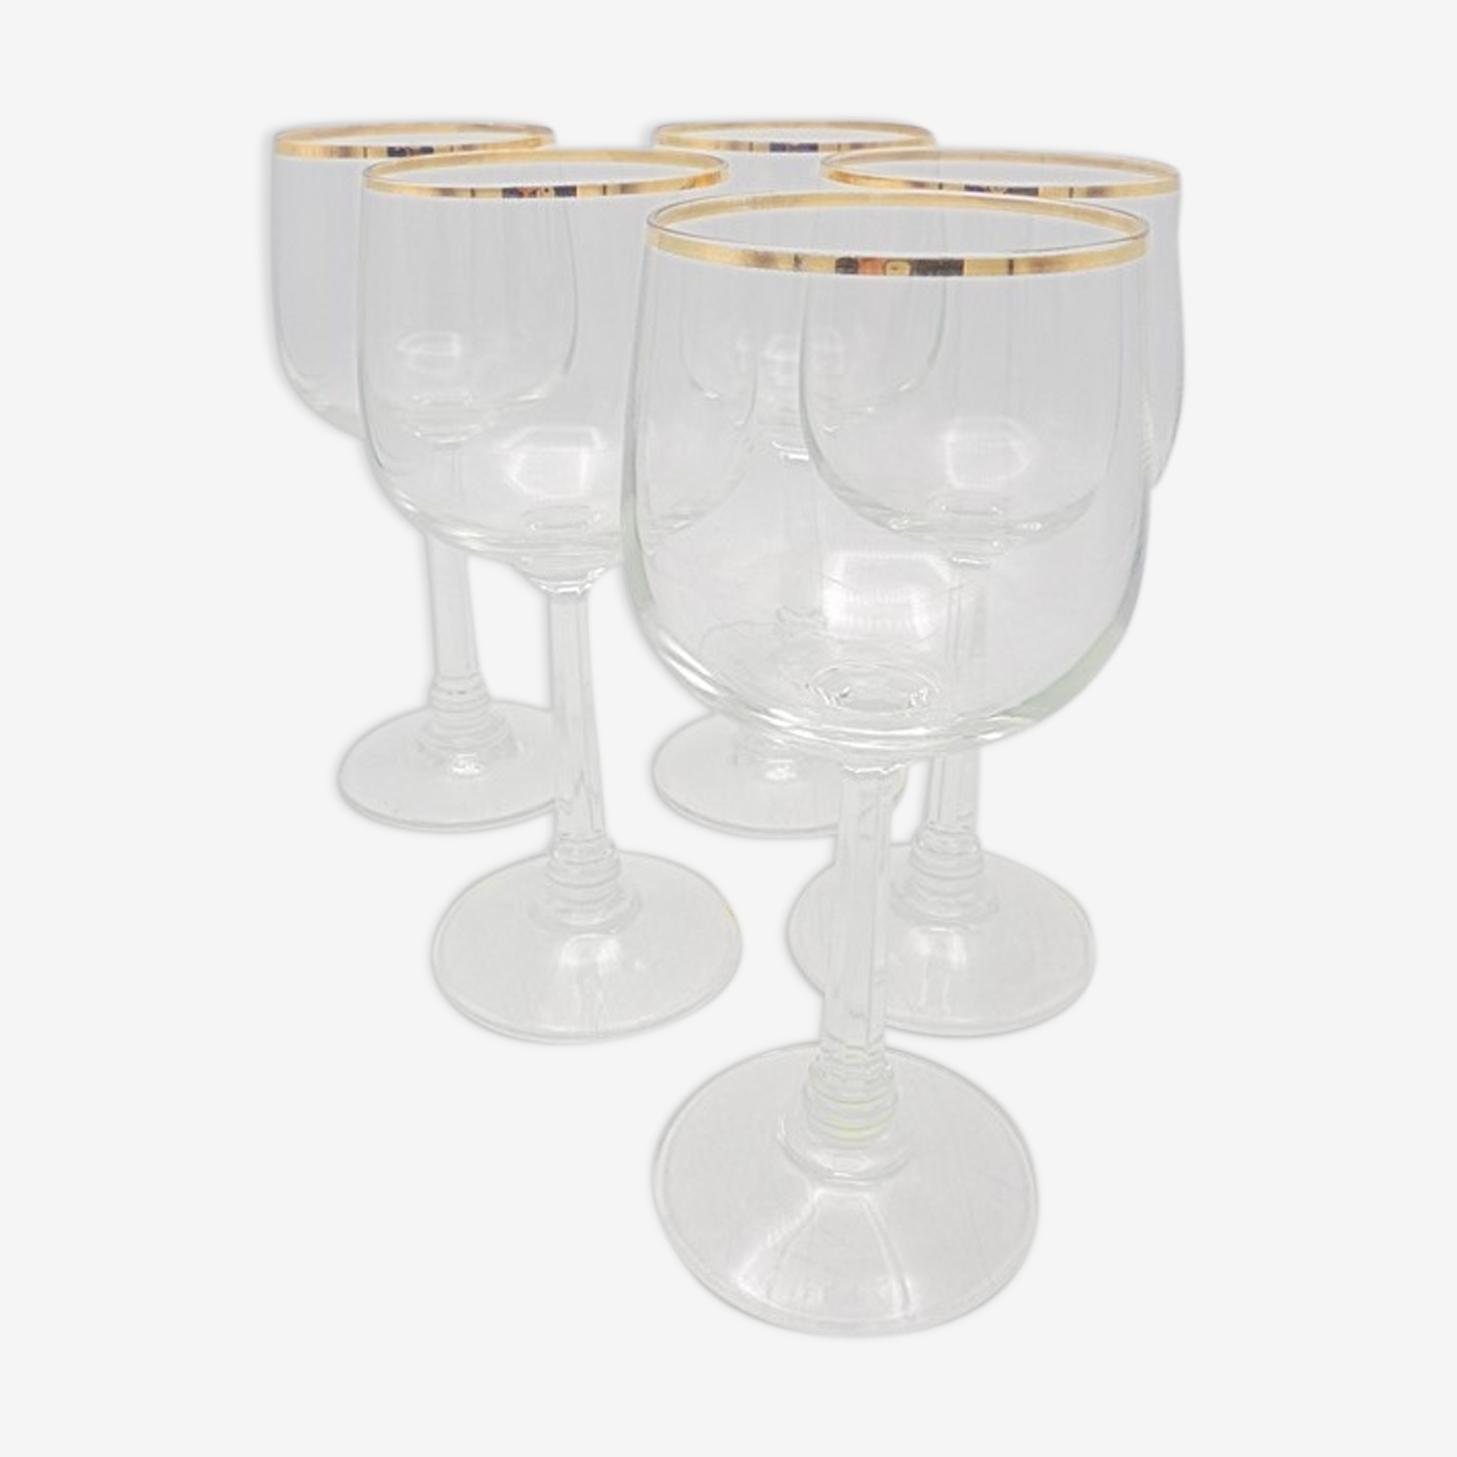 Ensemble de 5 verres